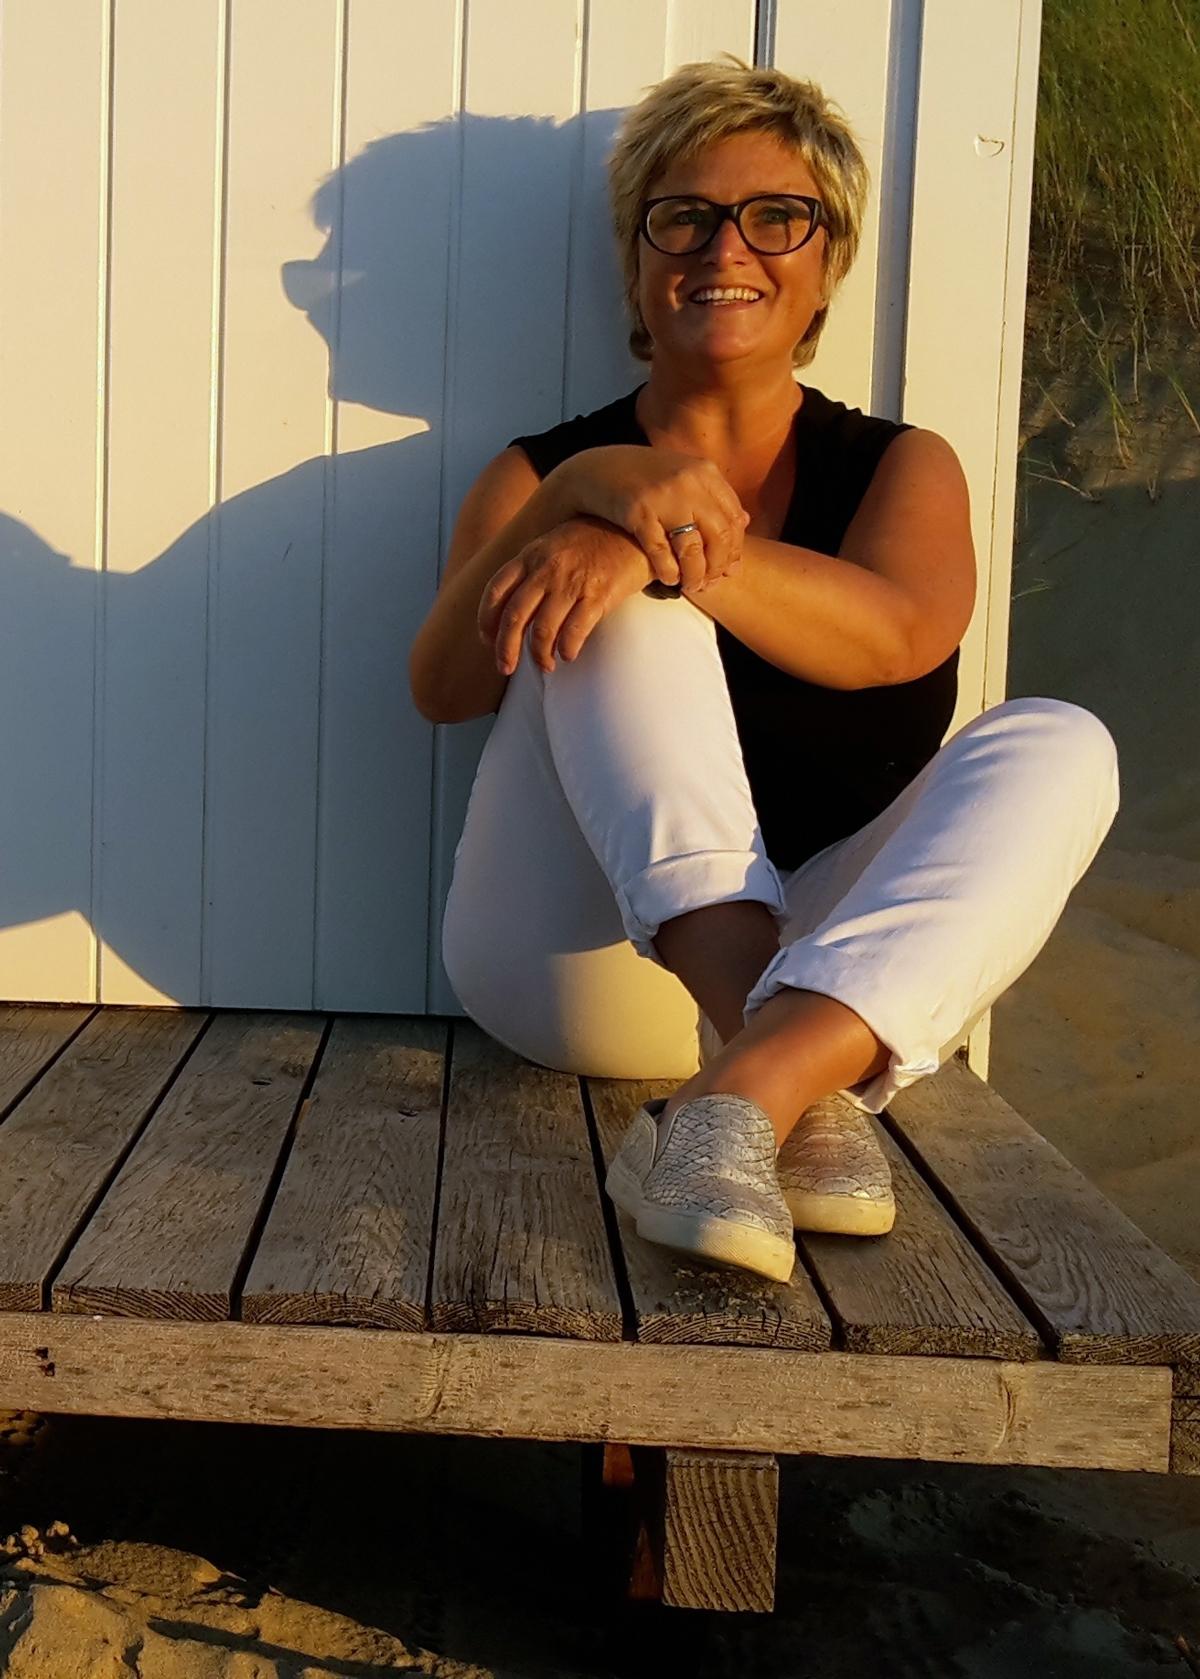 Peggy de keyser, geeft kleuter- en kinderyoga in Yogastudio Bornem